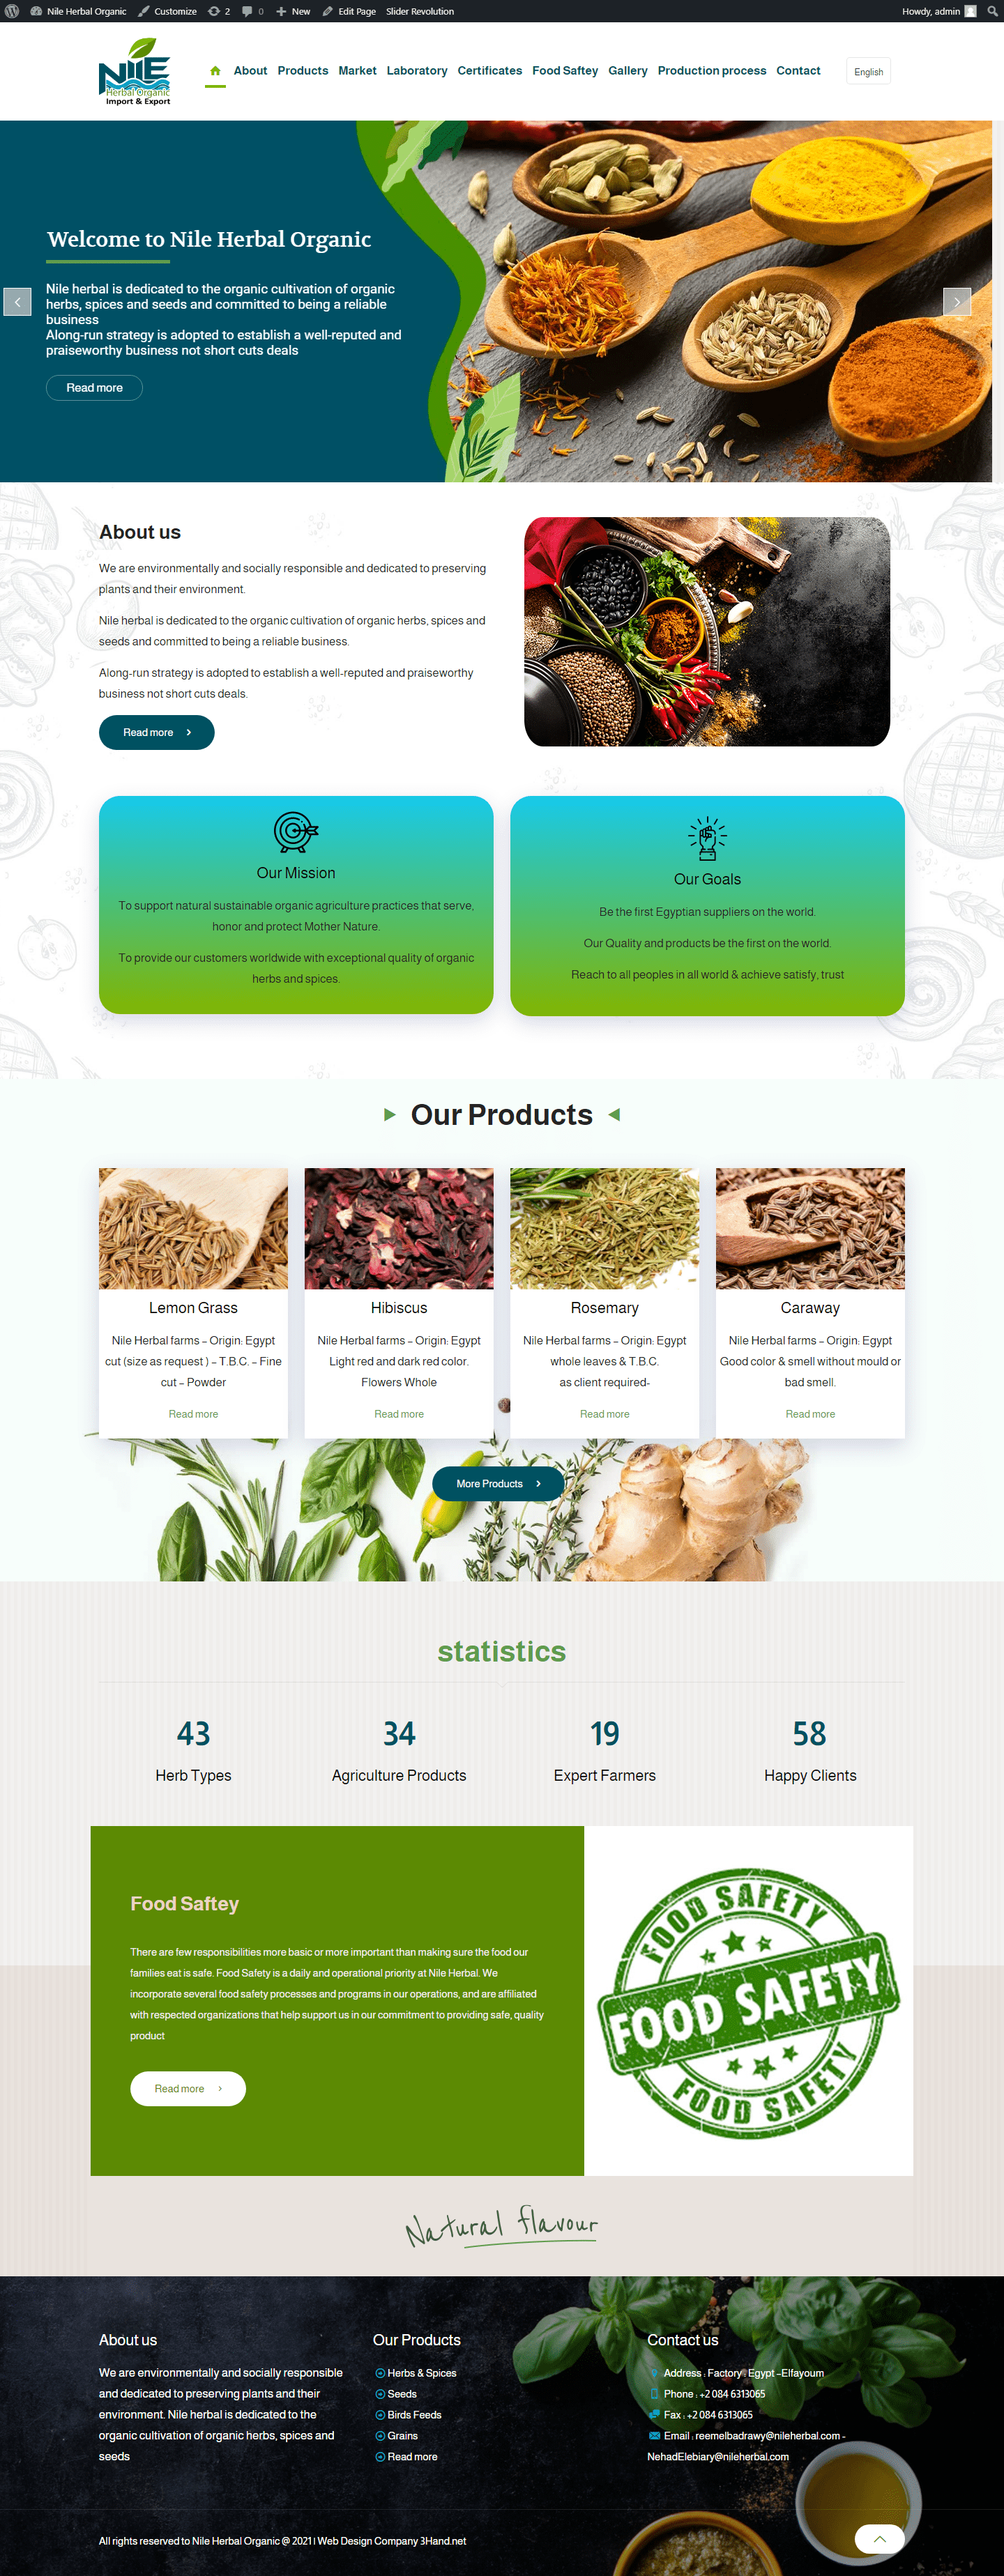 Nile-Herbal-Organic